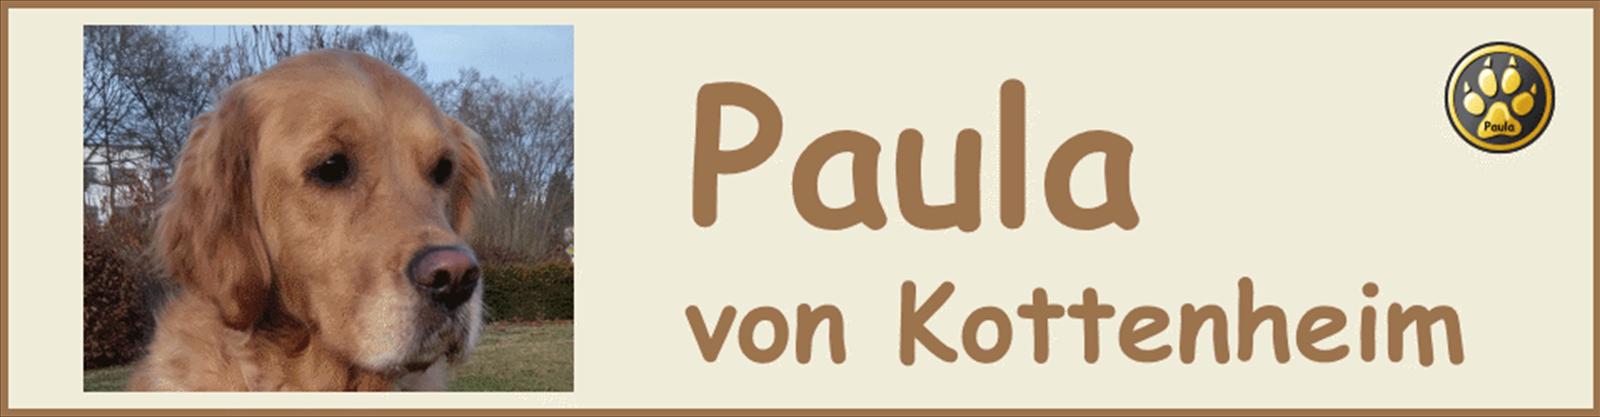 Paula-Banner-12